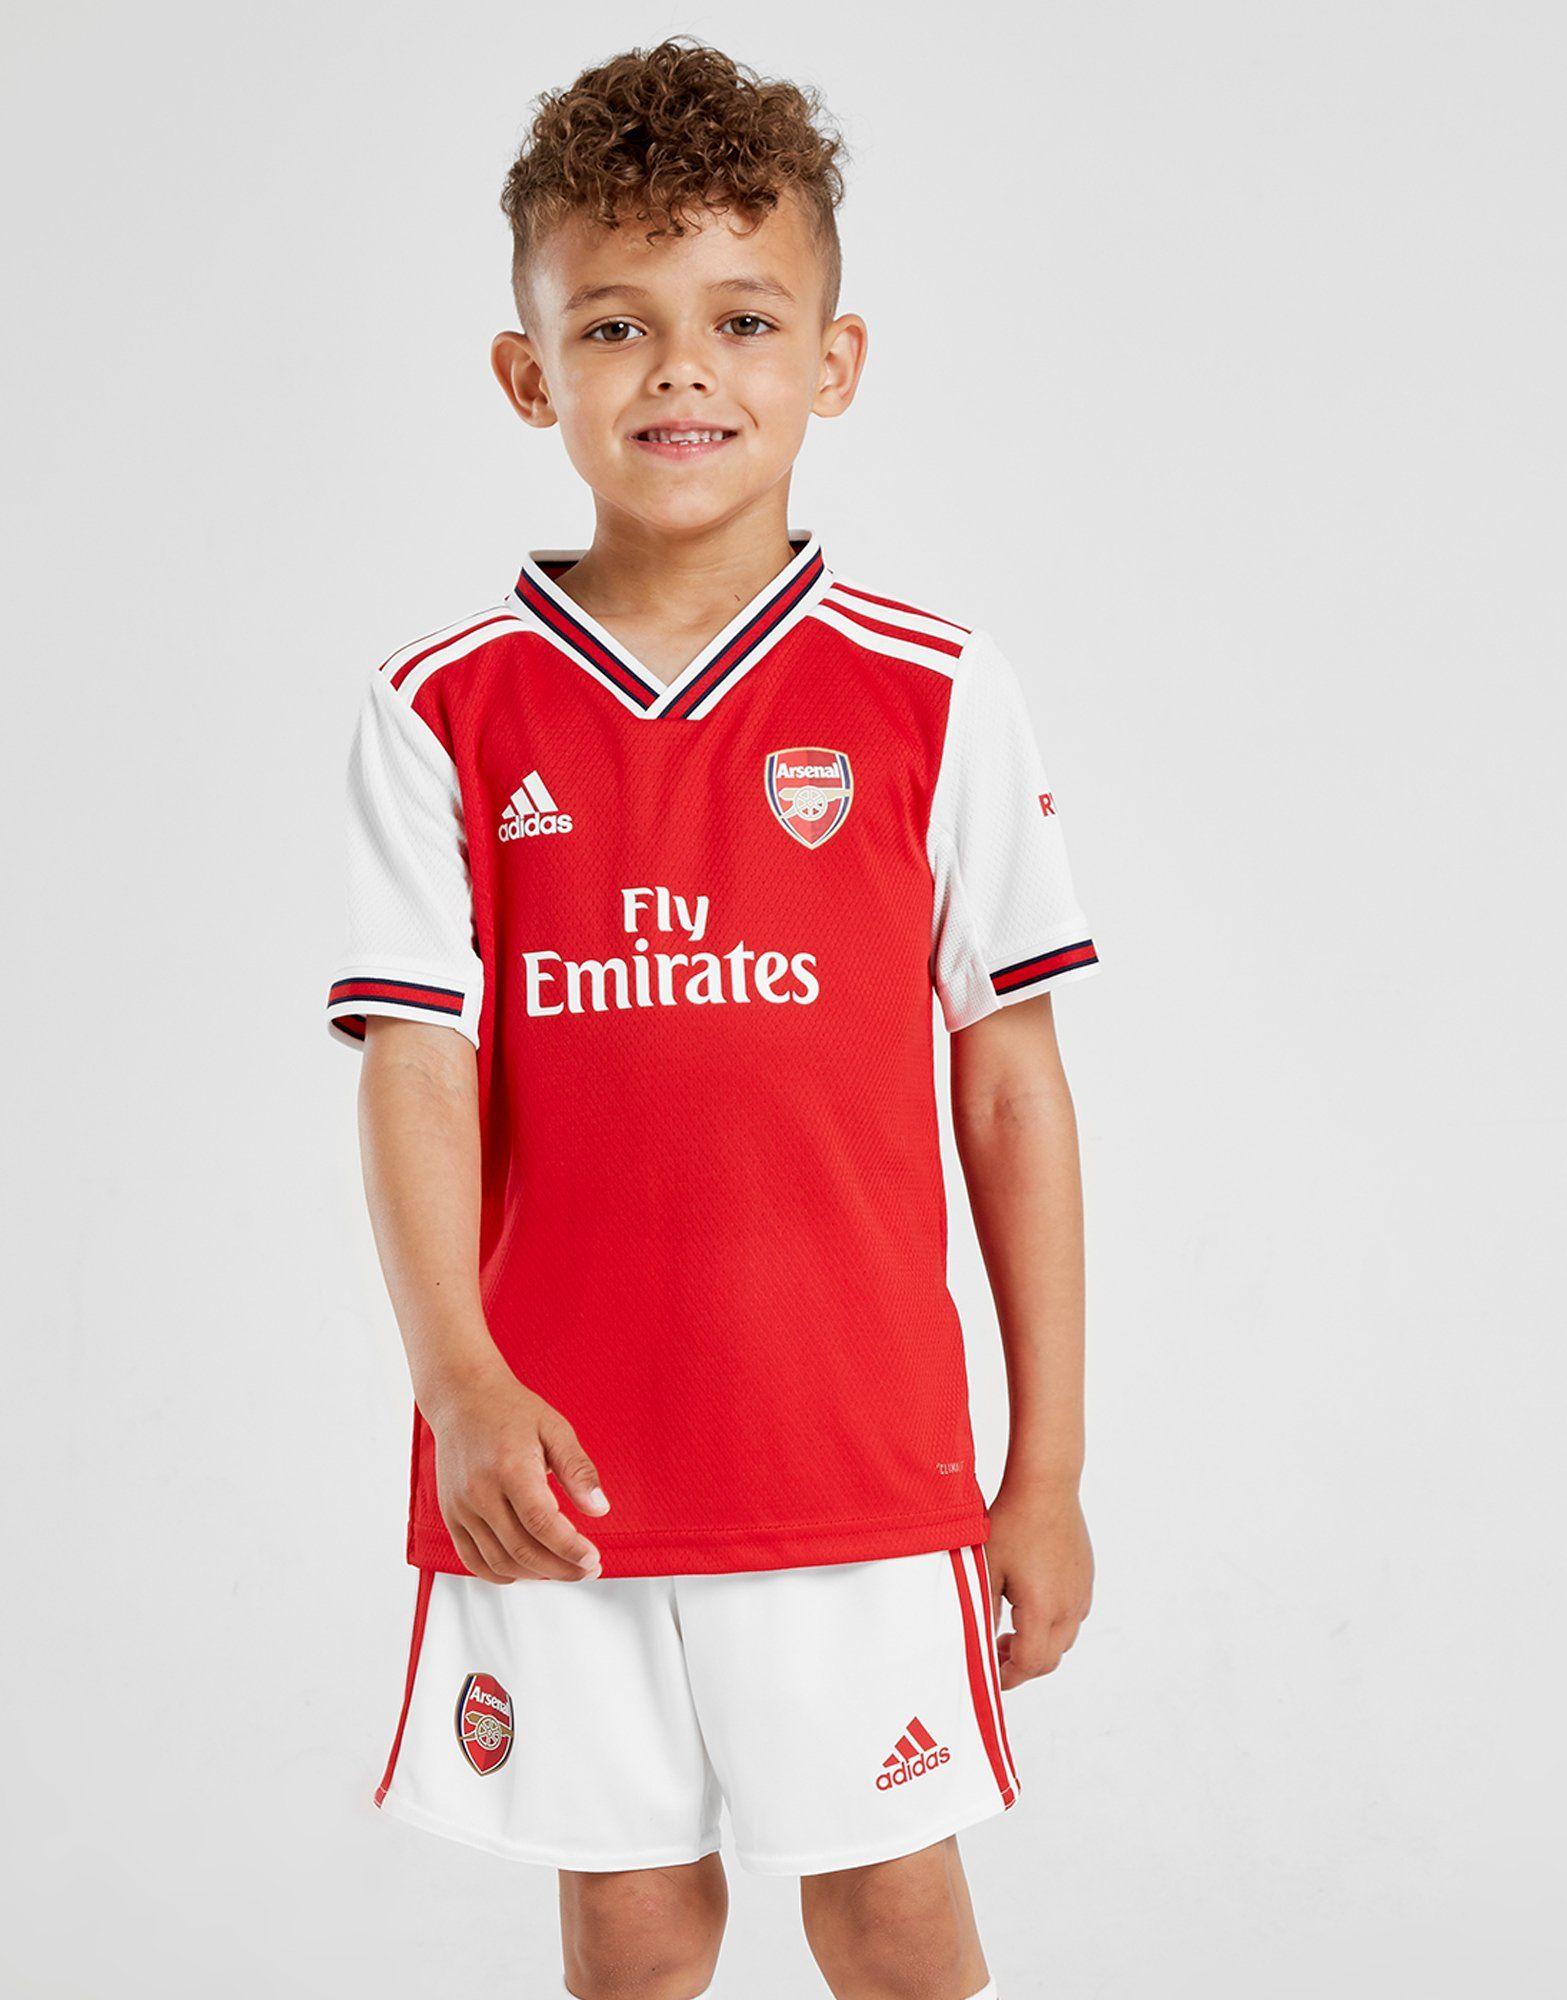 new product f6037 055a3 adidas Arsenal FC 2019/20 Home Kit Children | JD Sports Ireland